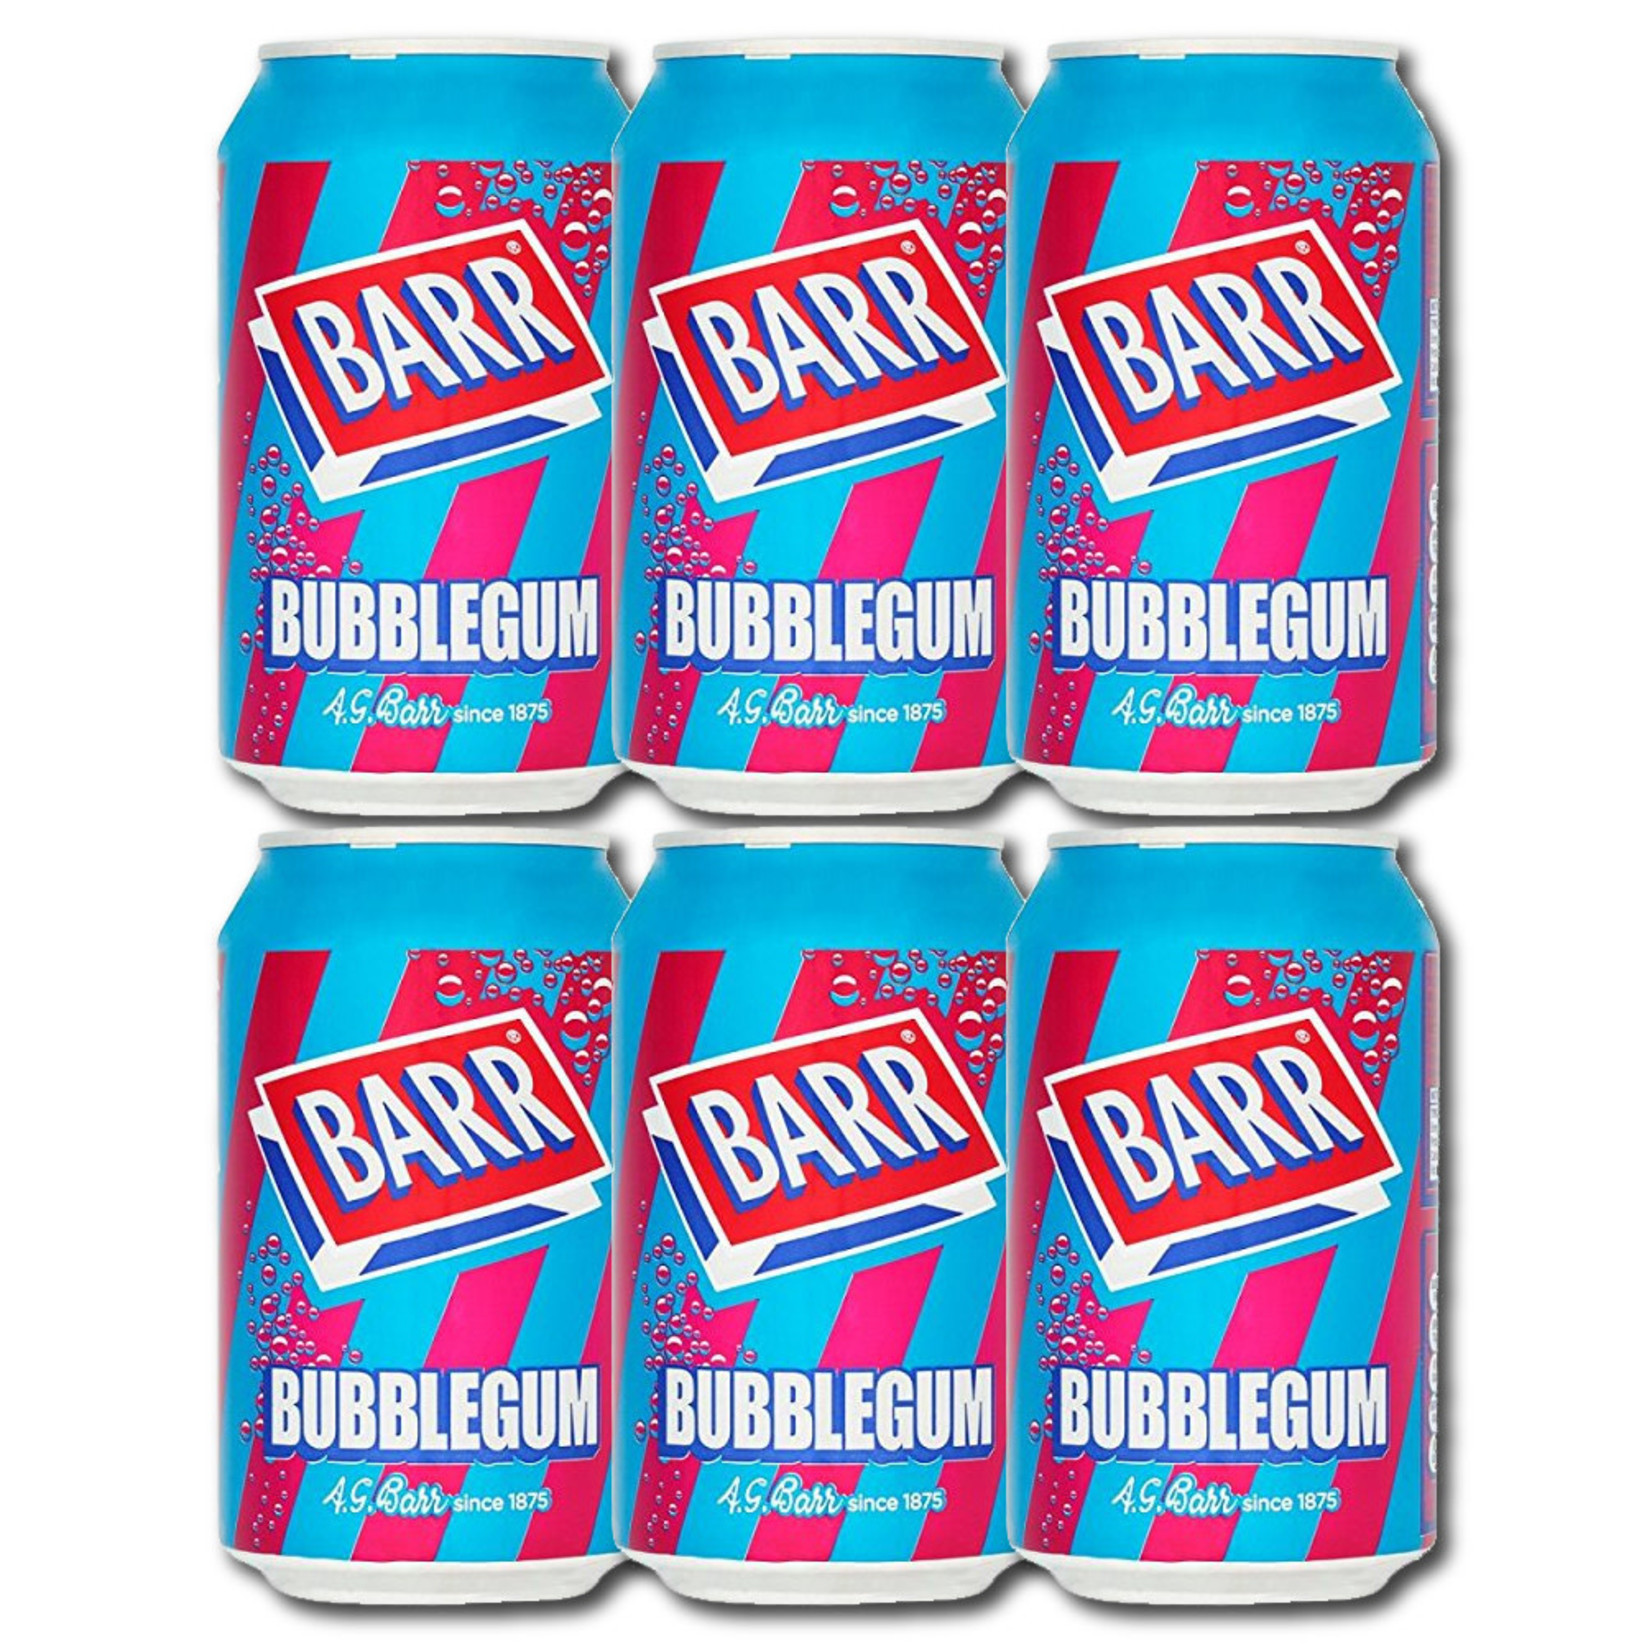 Barr Bubblegum Soda, 6-Pack